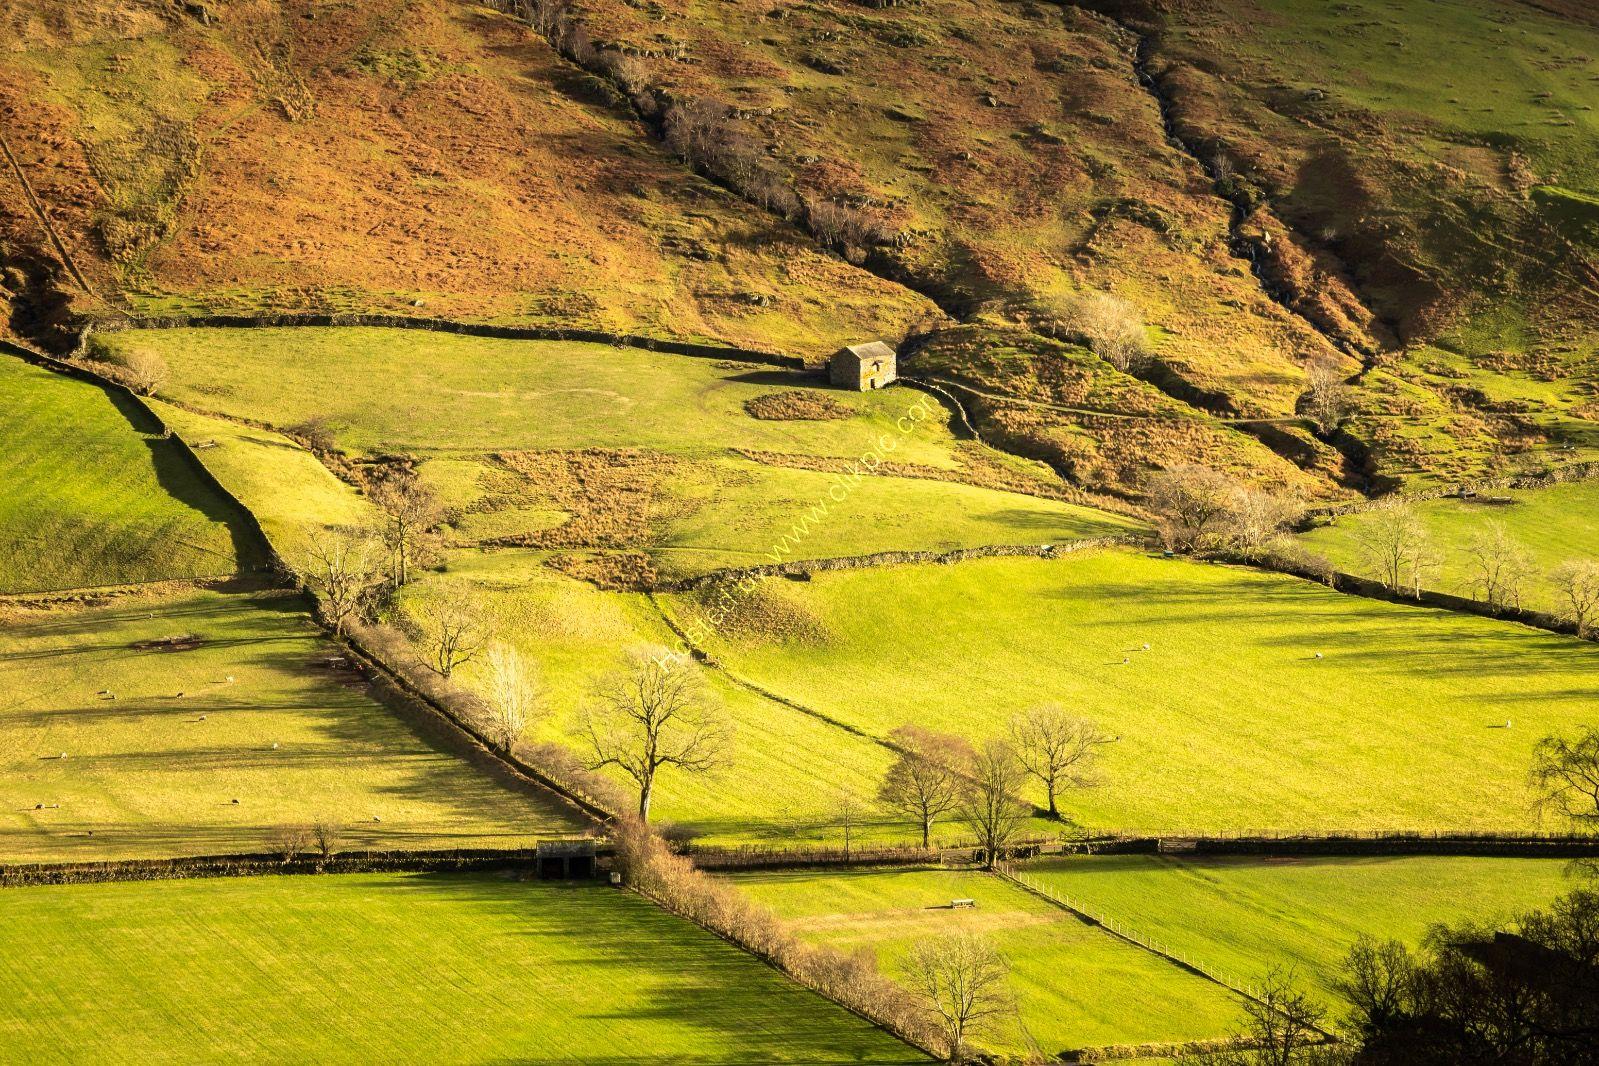 Barn Green Field Kirkstone Pass